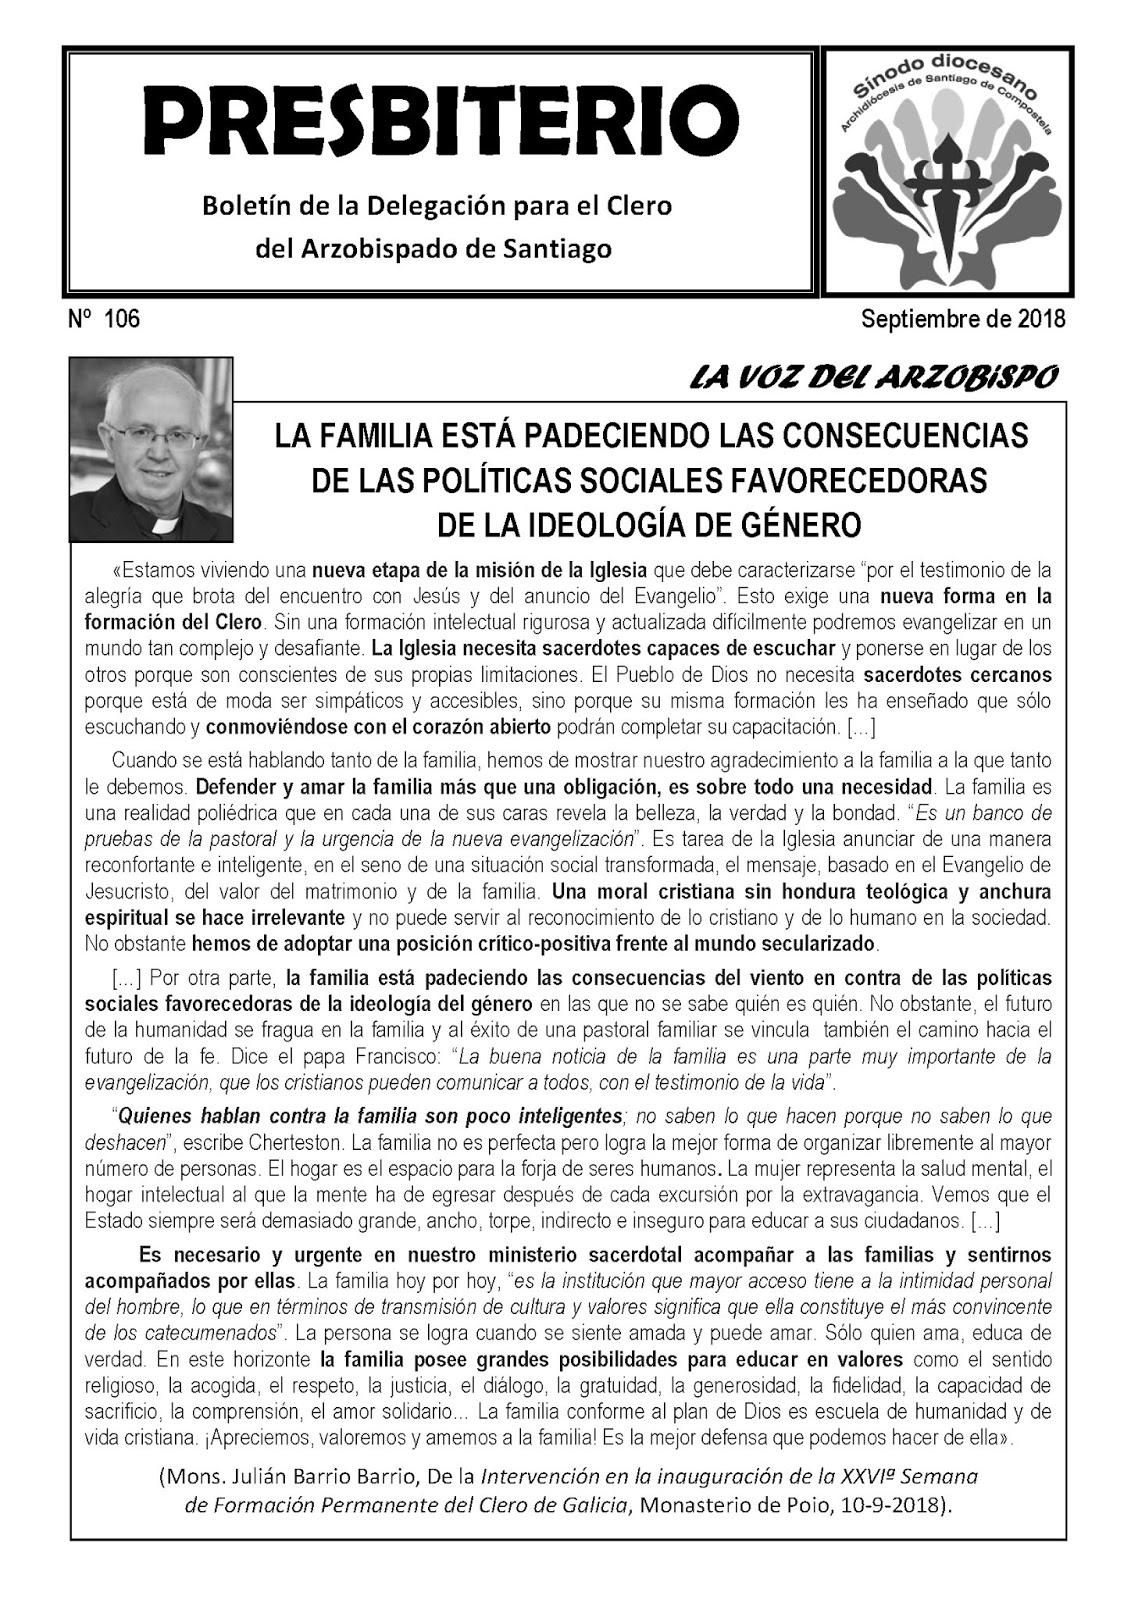 https://www.dropbox.com/s/dwefr0y44njr2fg/Presbiterio_106.pdf?dl=0